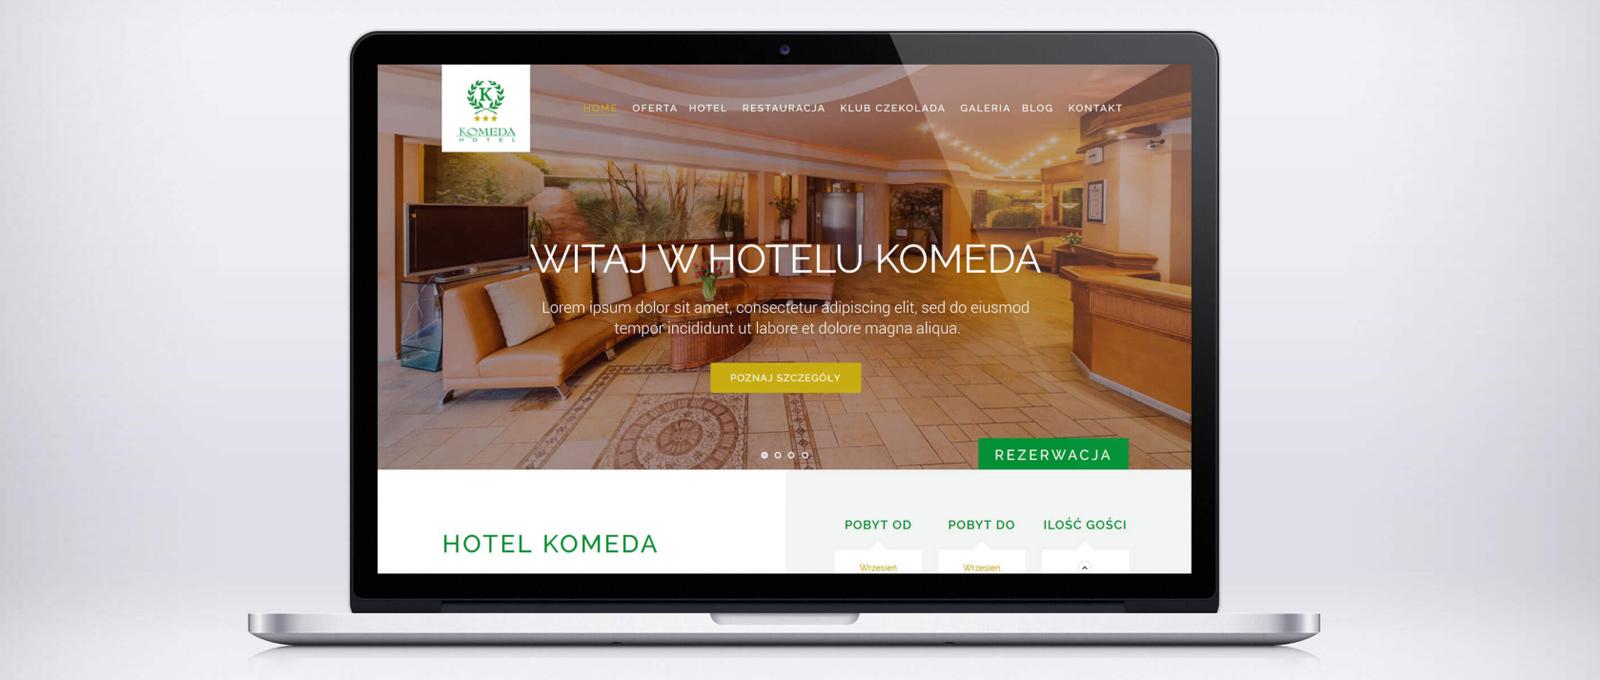 Nowa strona internetowa Hotelu Komeda